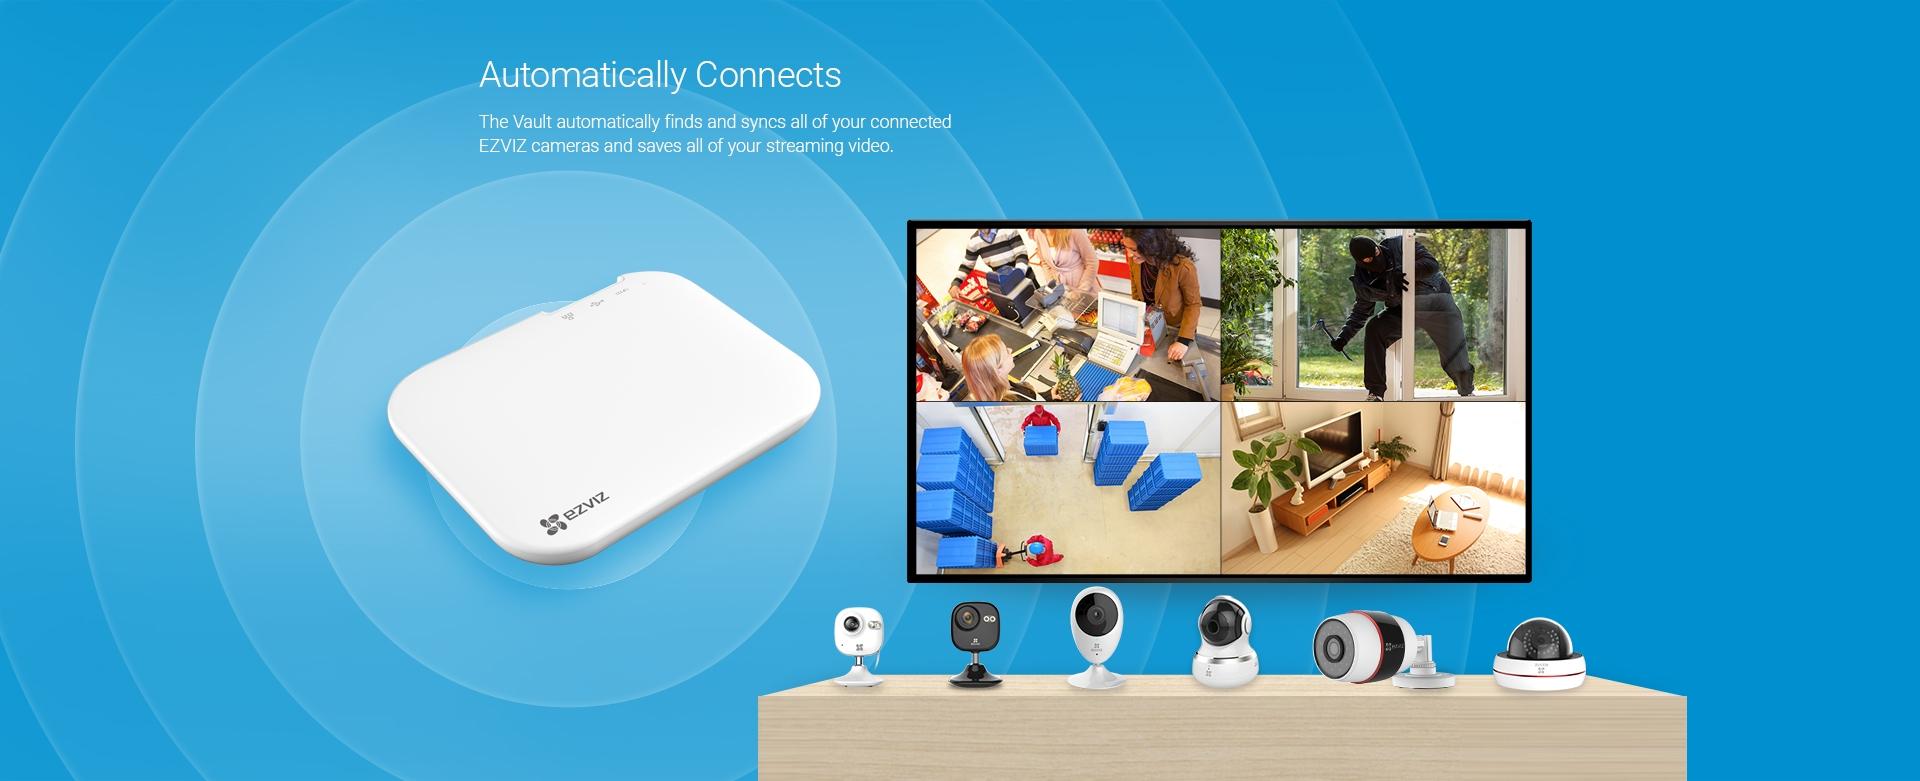 Ezviz X3 Smart video recorder - Excel Technologies Ltd